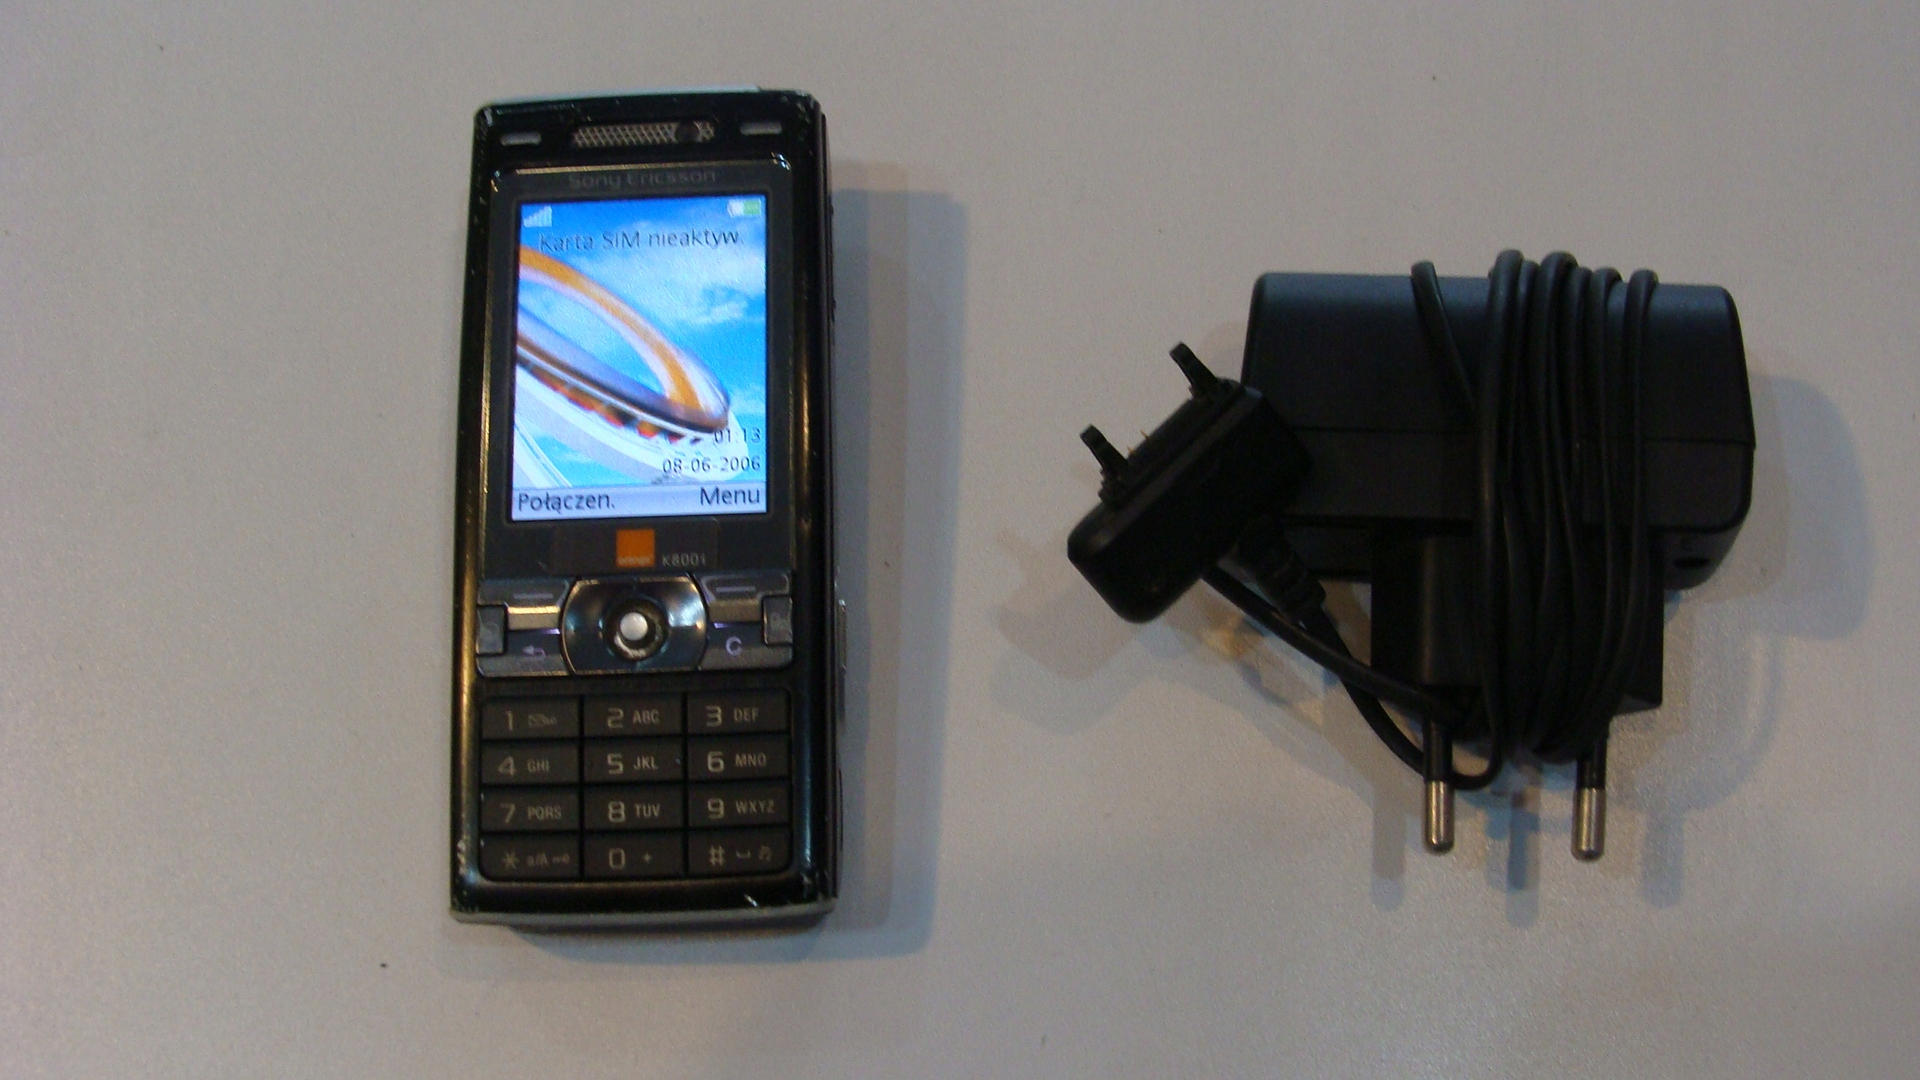 Sony Ericsson K800i ! KLASYK ! OKAZJA !